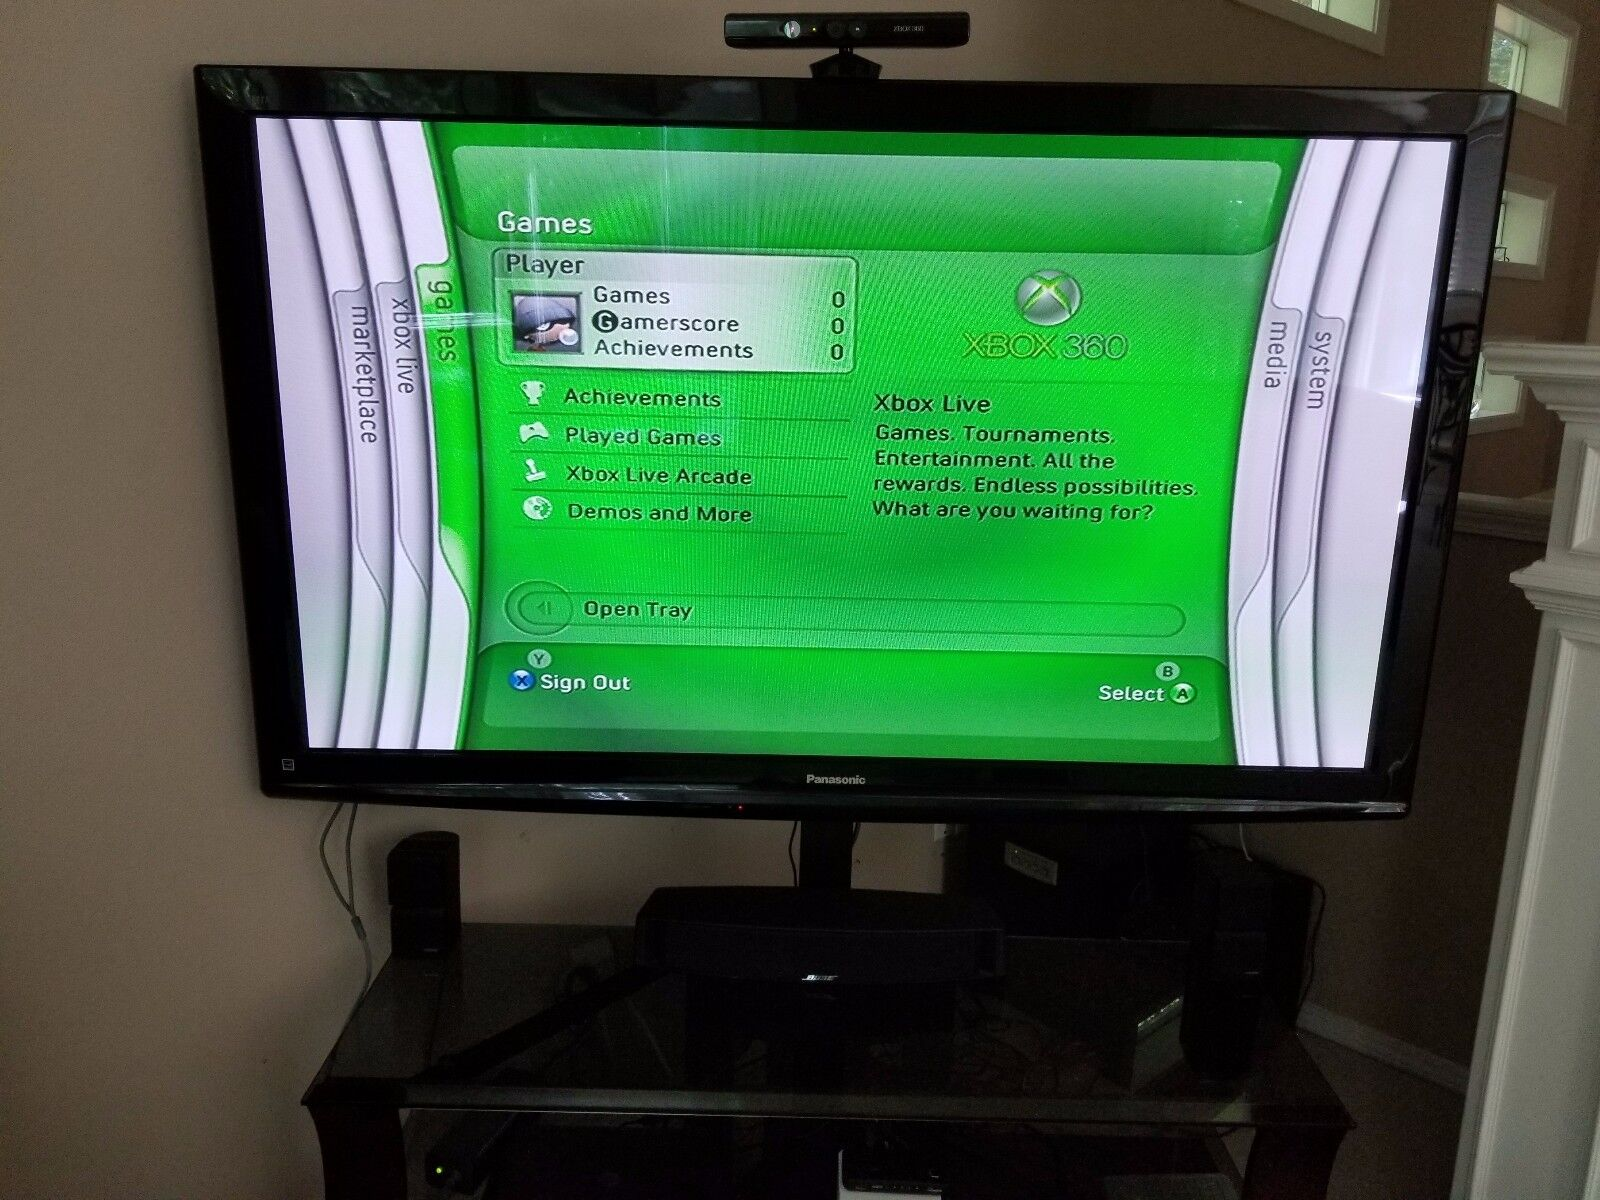 Xbox 360 - Pre NXE Xbox 360 Consoles